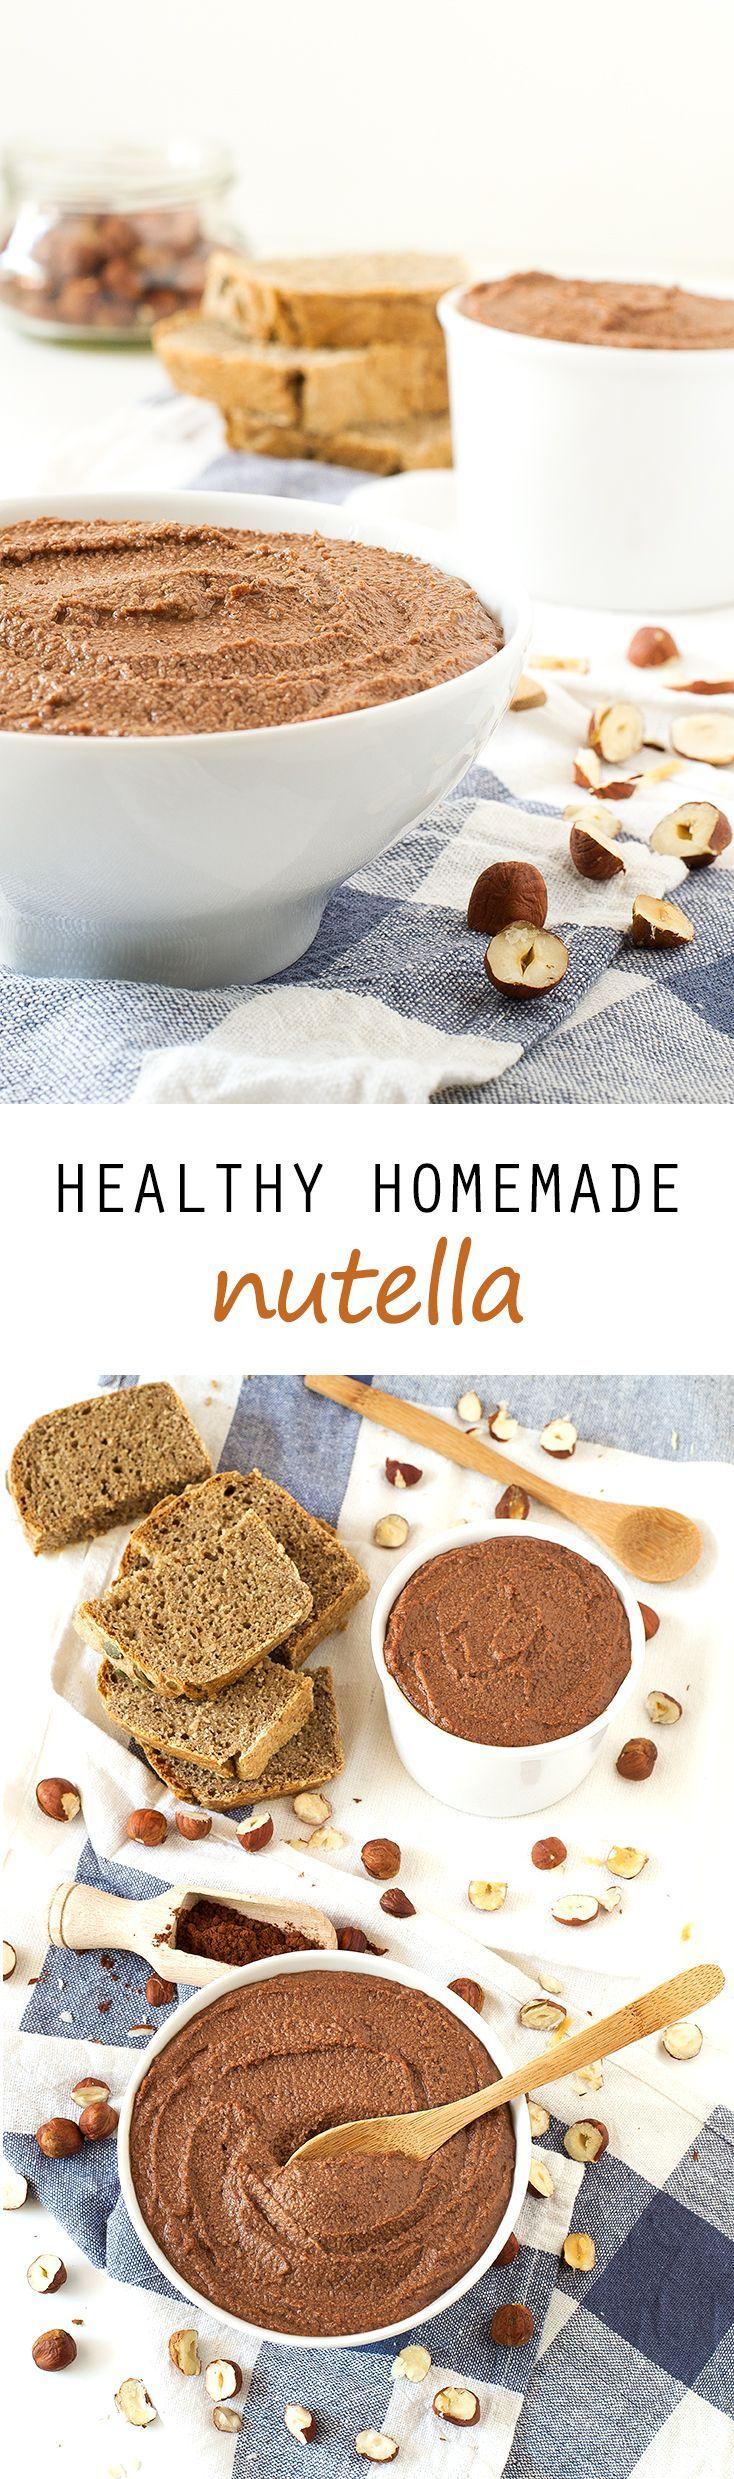 Healthy Homemade Nutella #vegan #glutenfree